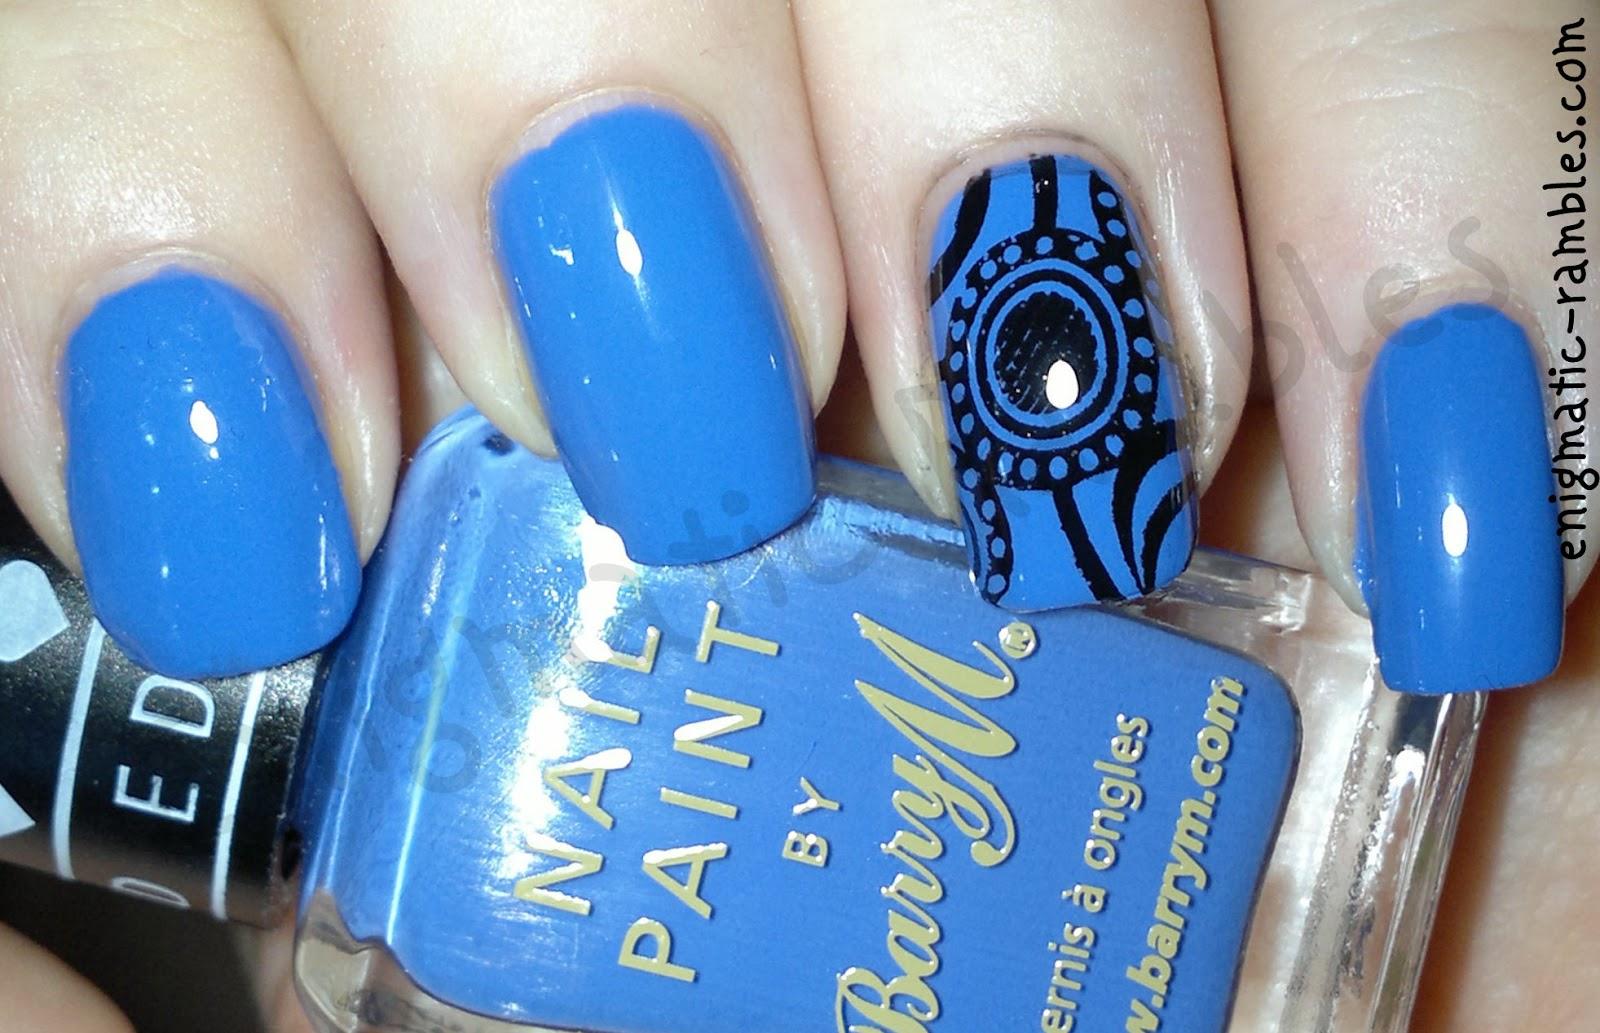 barry-m-bikini-moyou-nails-special-nail-polish-black-bundle-monster-422-BM422